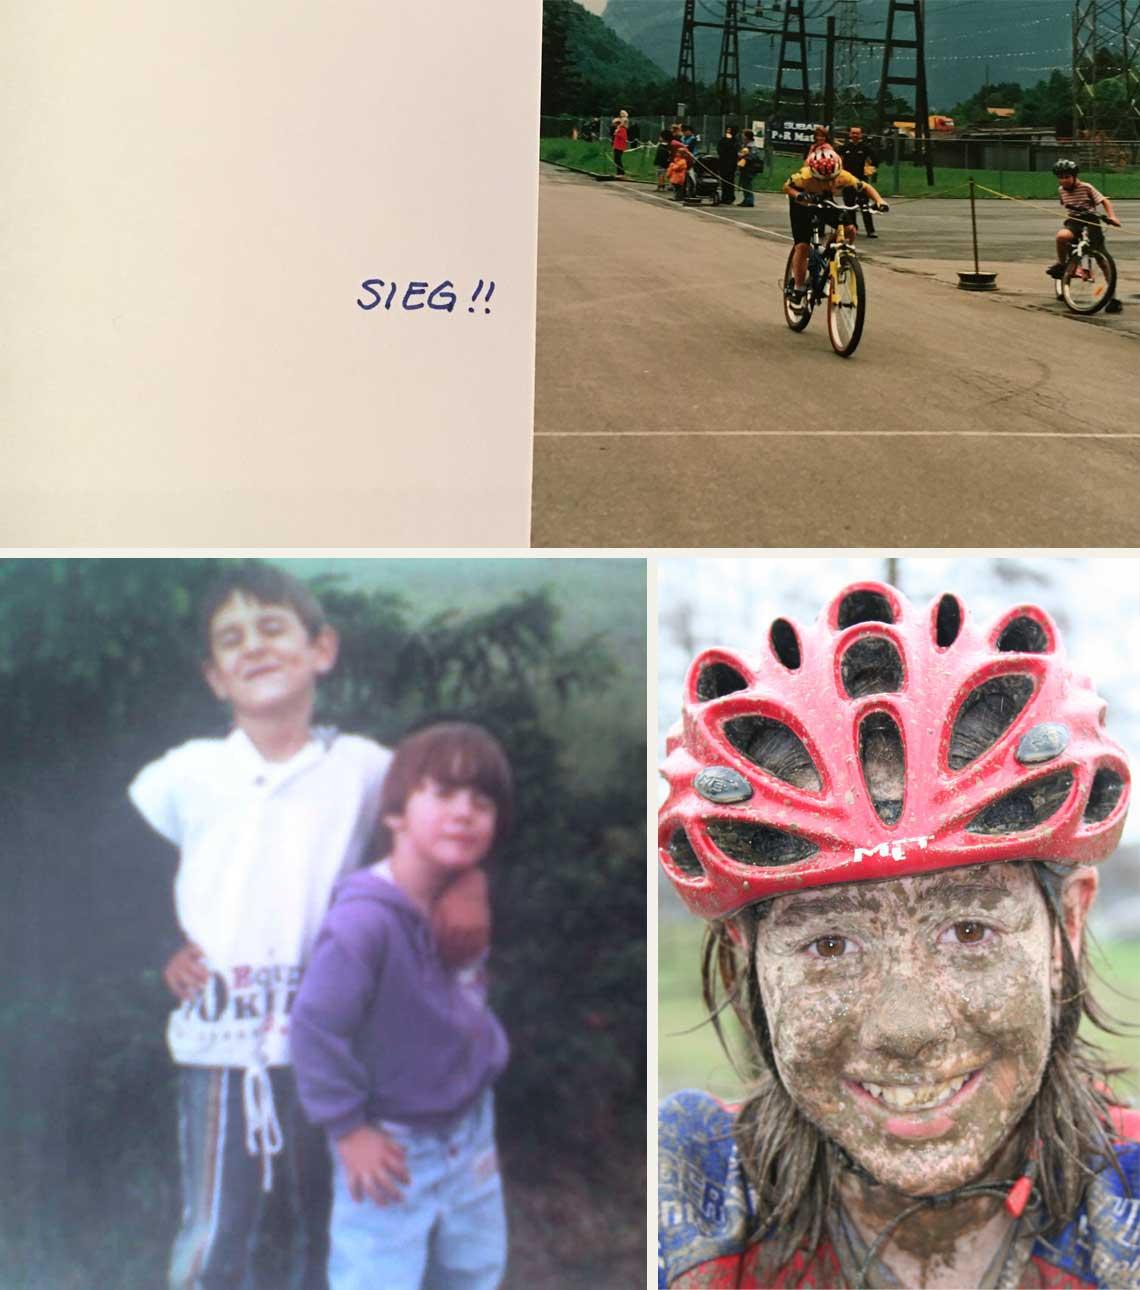 Linda Indergand growing up